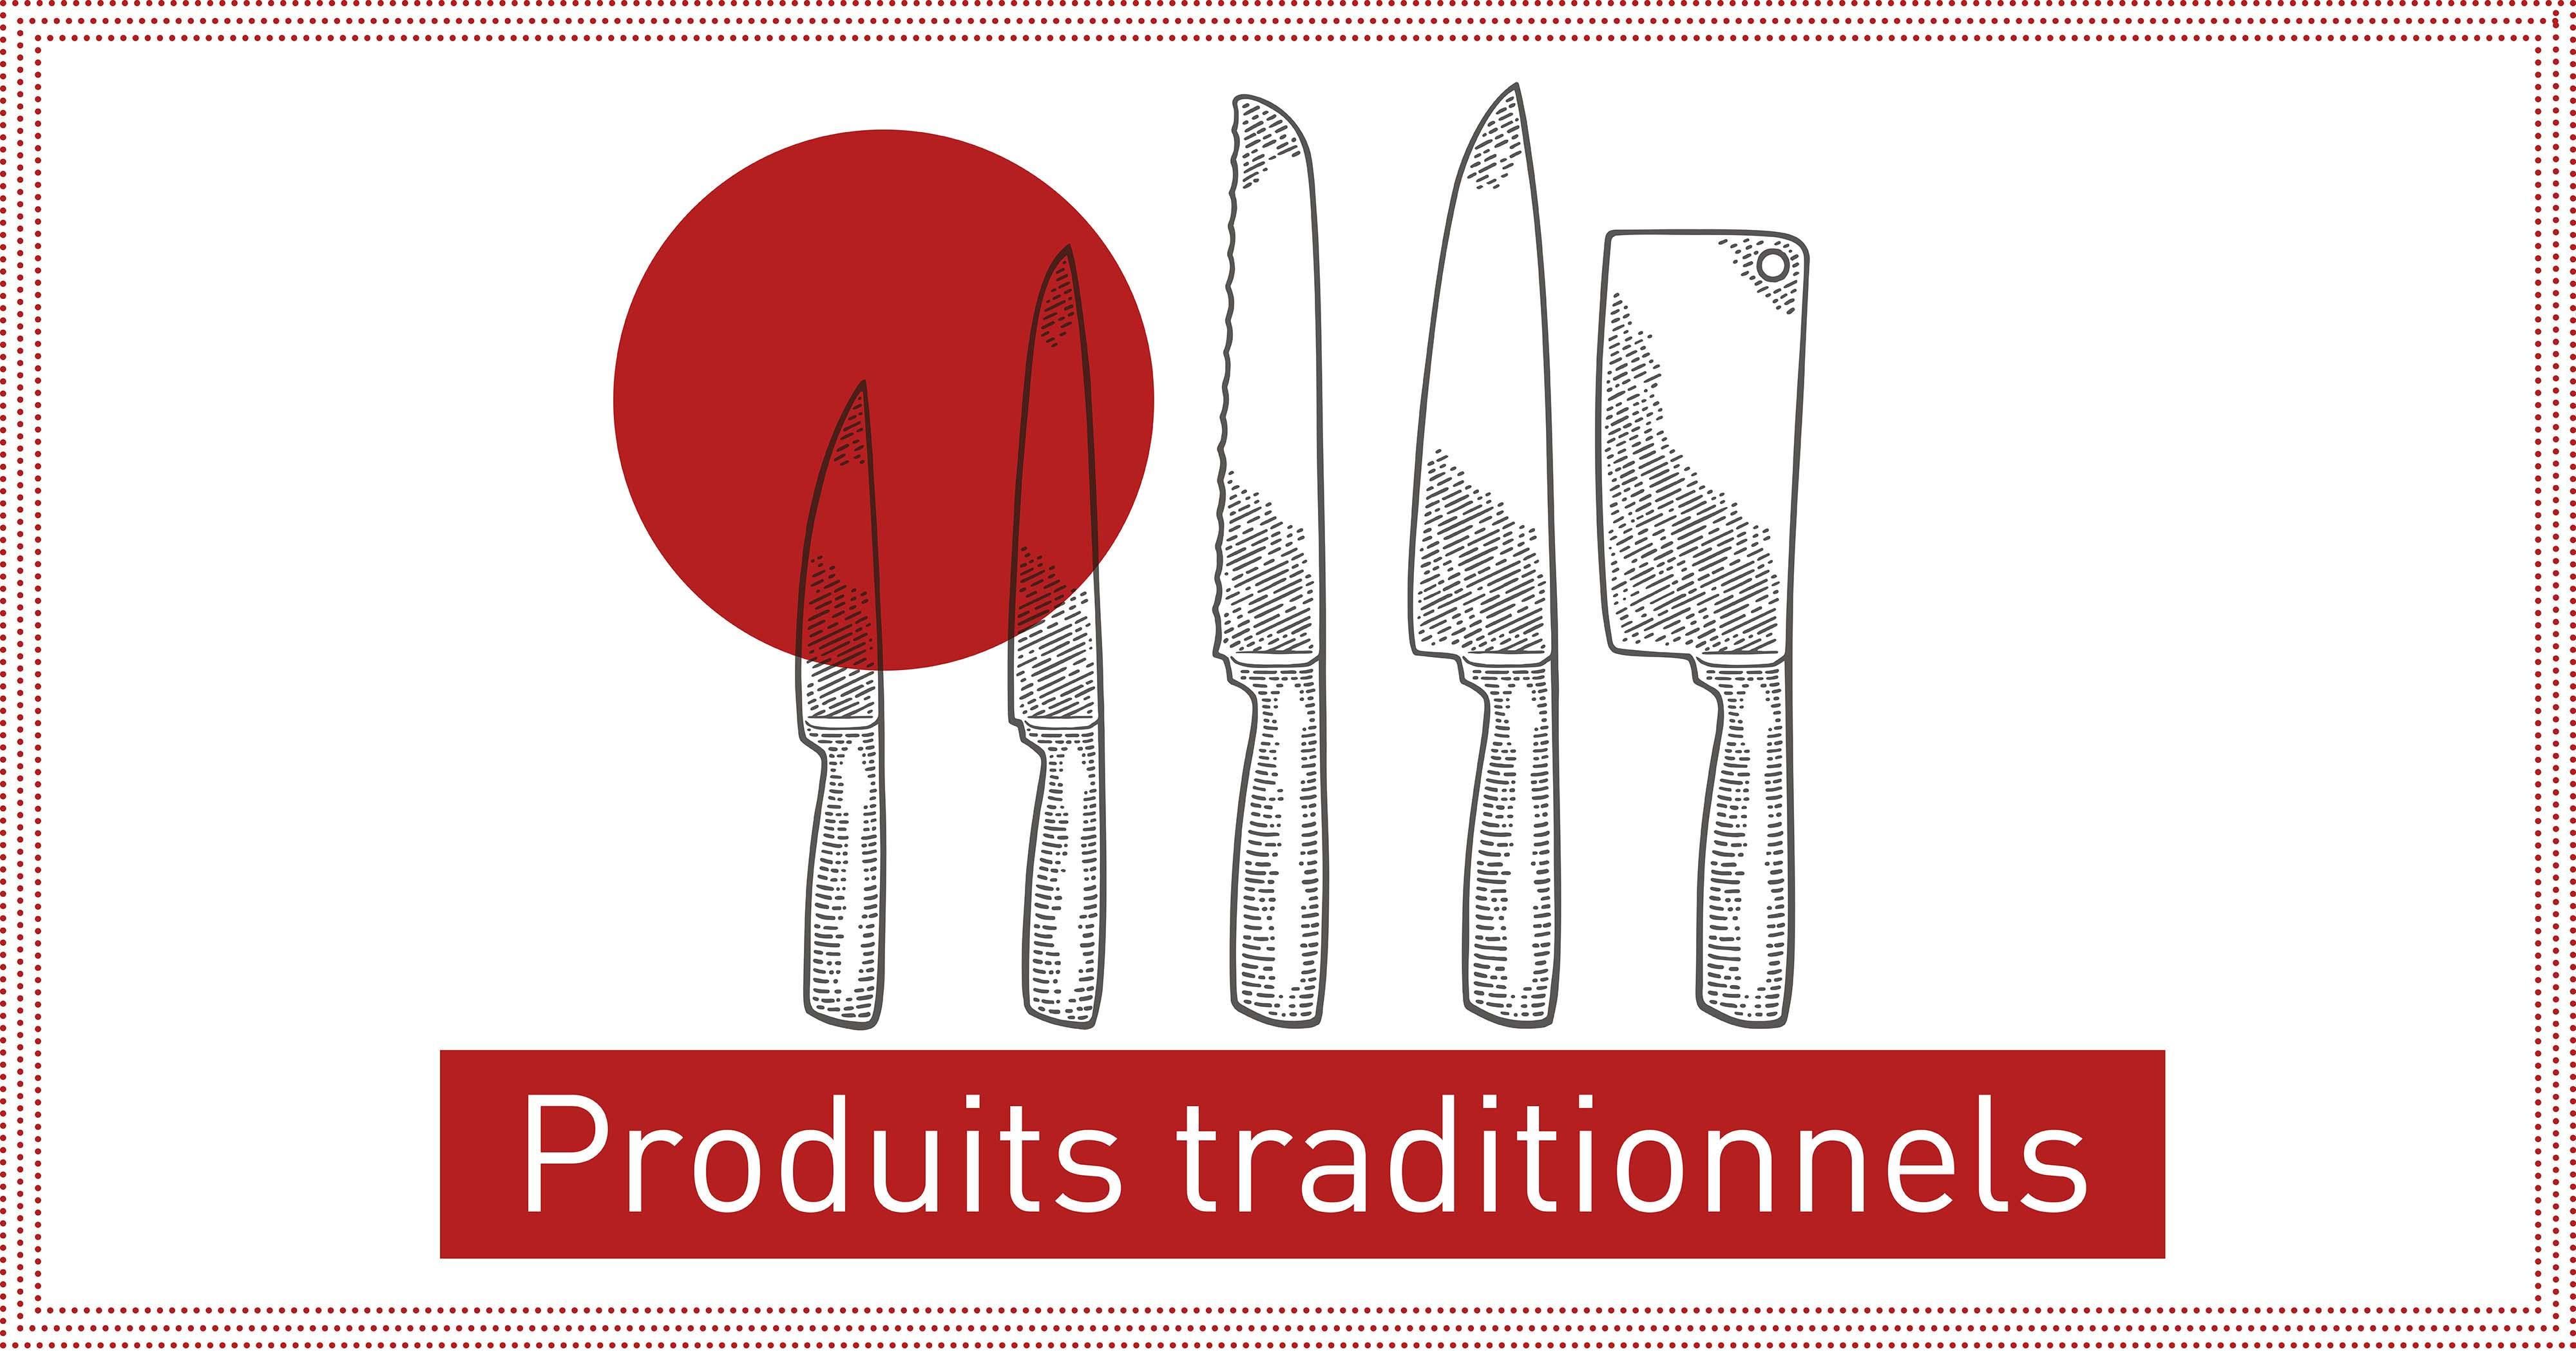 Produits traditionnels